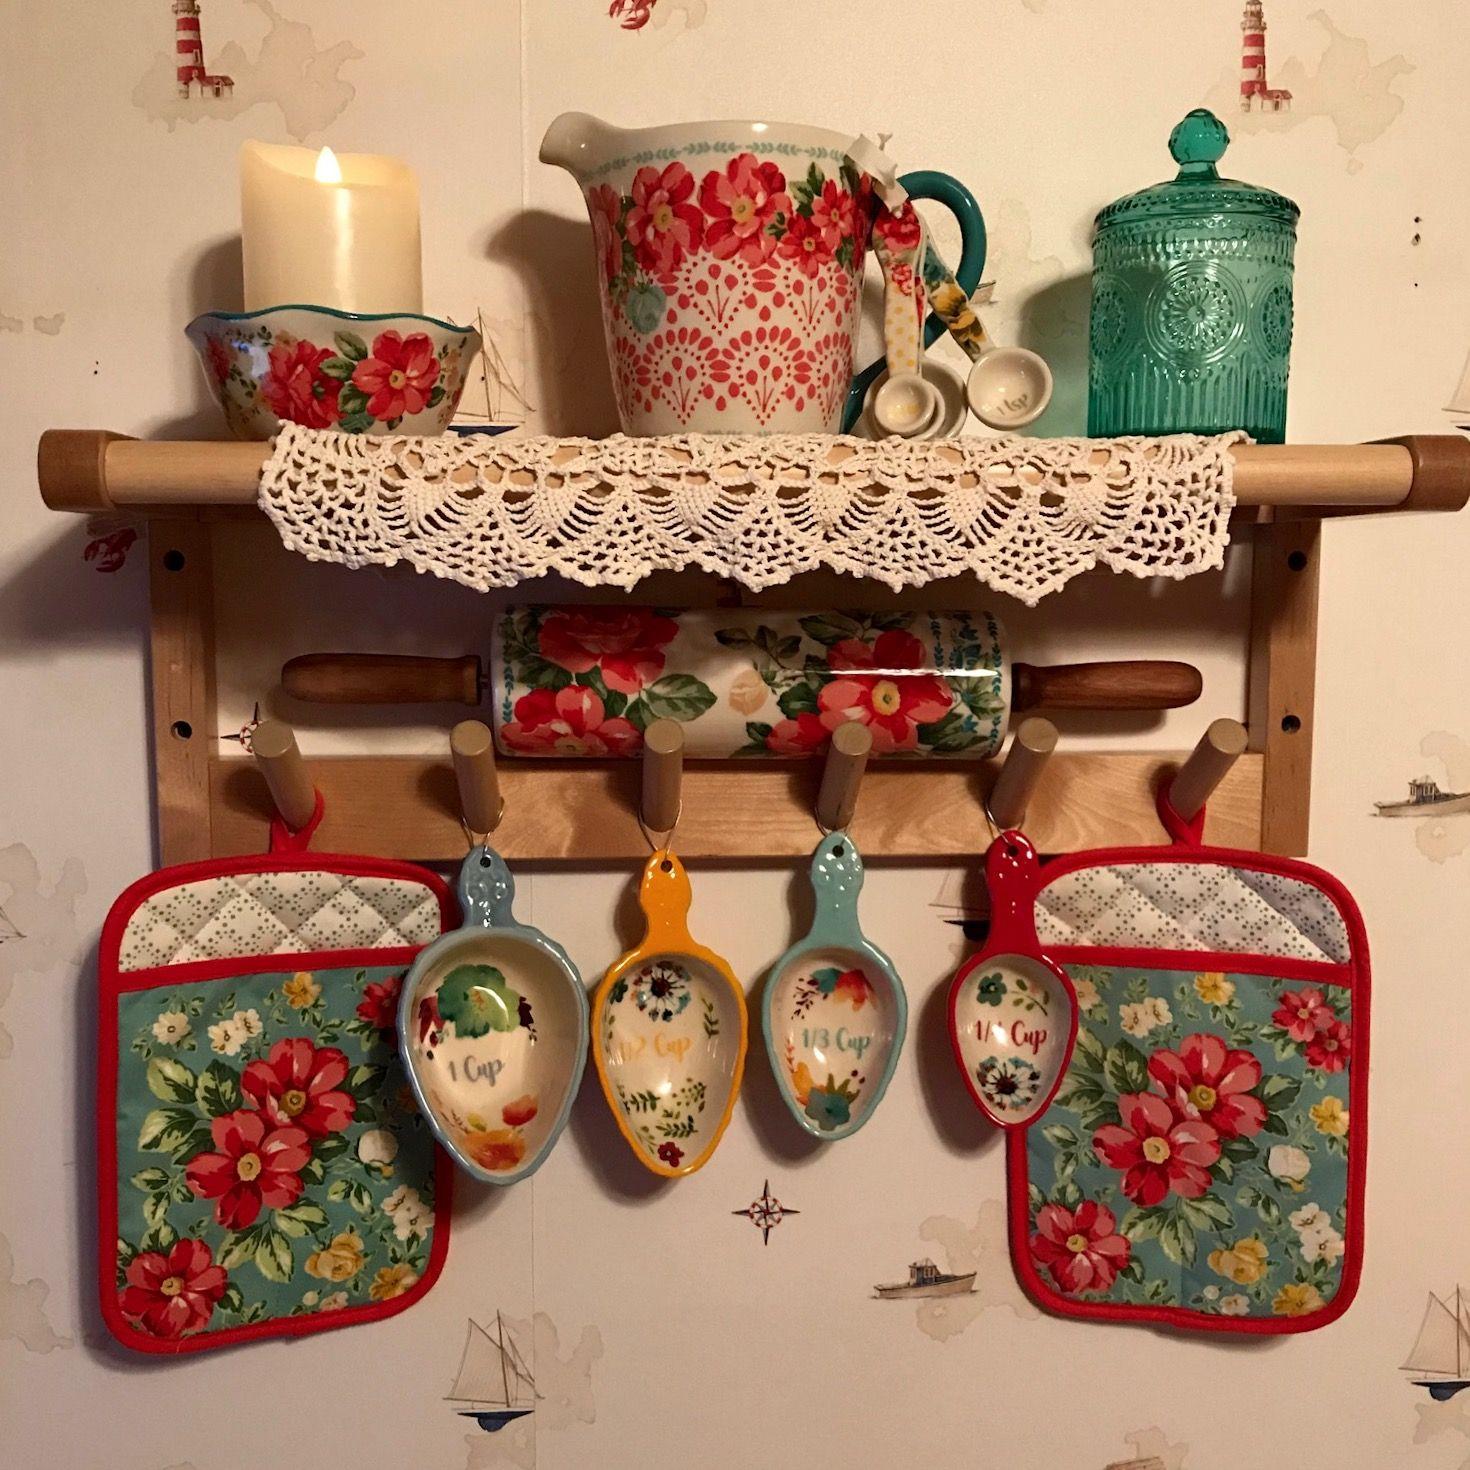 pioneer woman kitchen pioneer woman kitchen pioneer woman kitchen decor on kitchen decor pitchers carafes id=18785